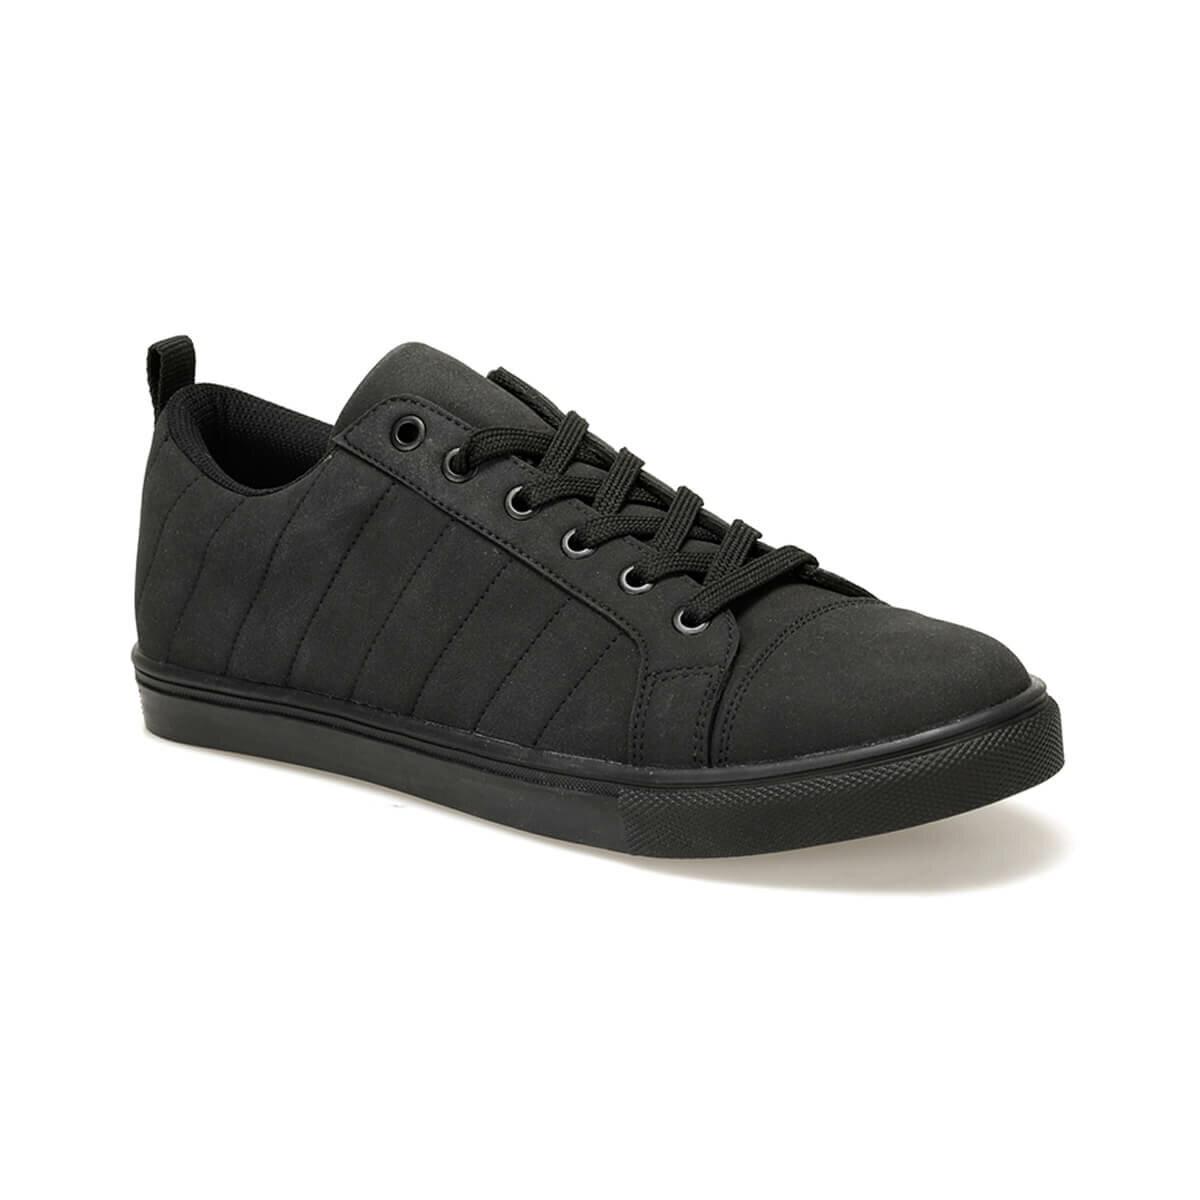 FLO KP-012 zapatos negros para hombre Panama Club